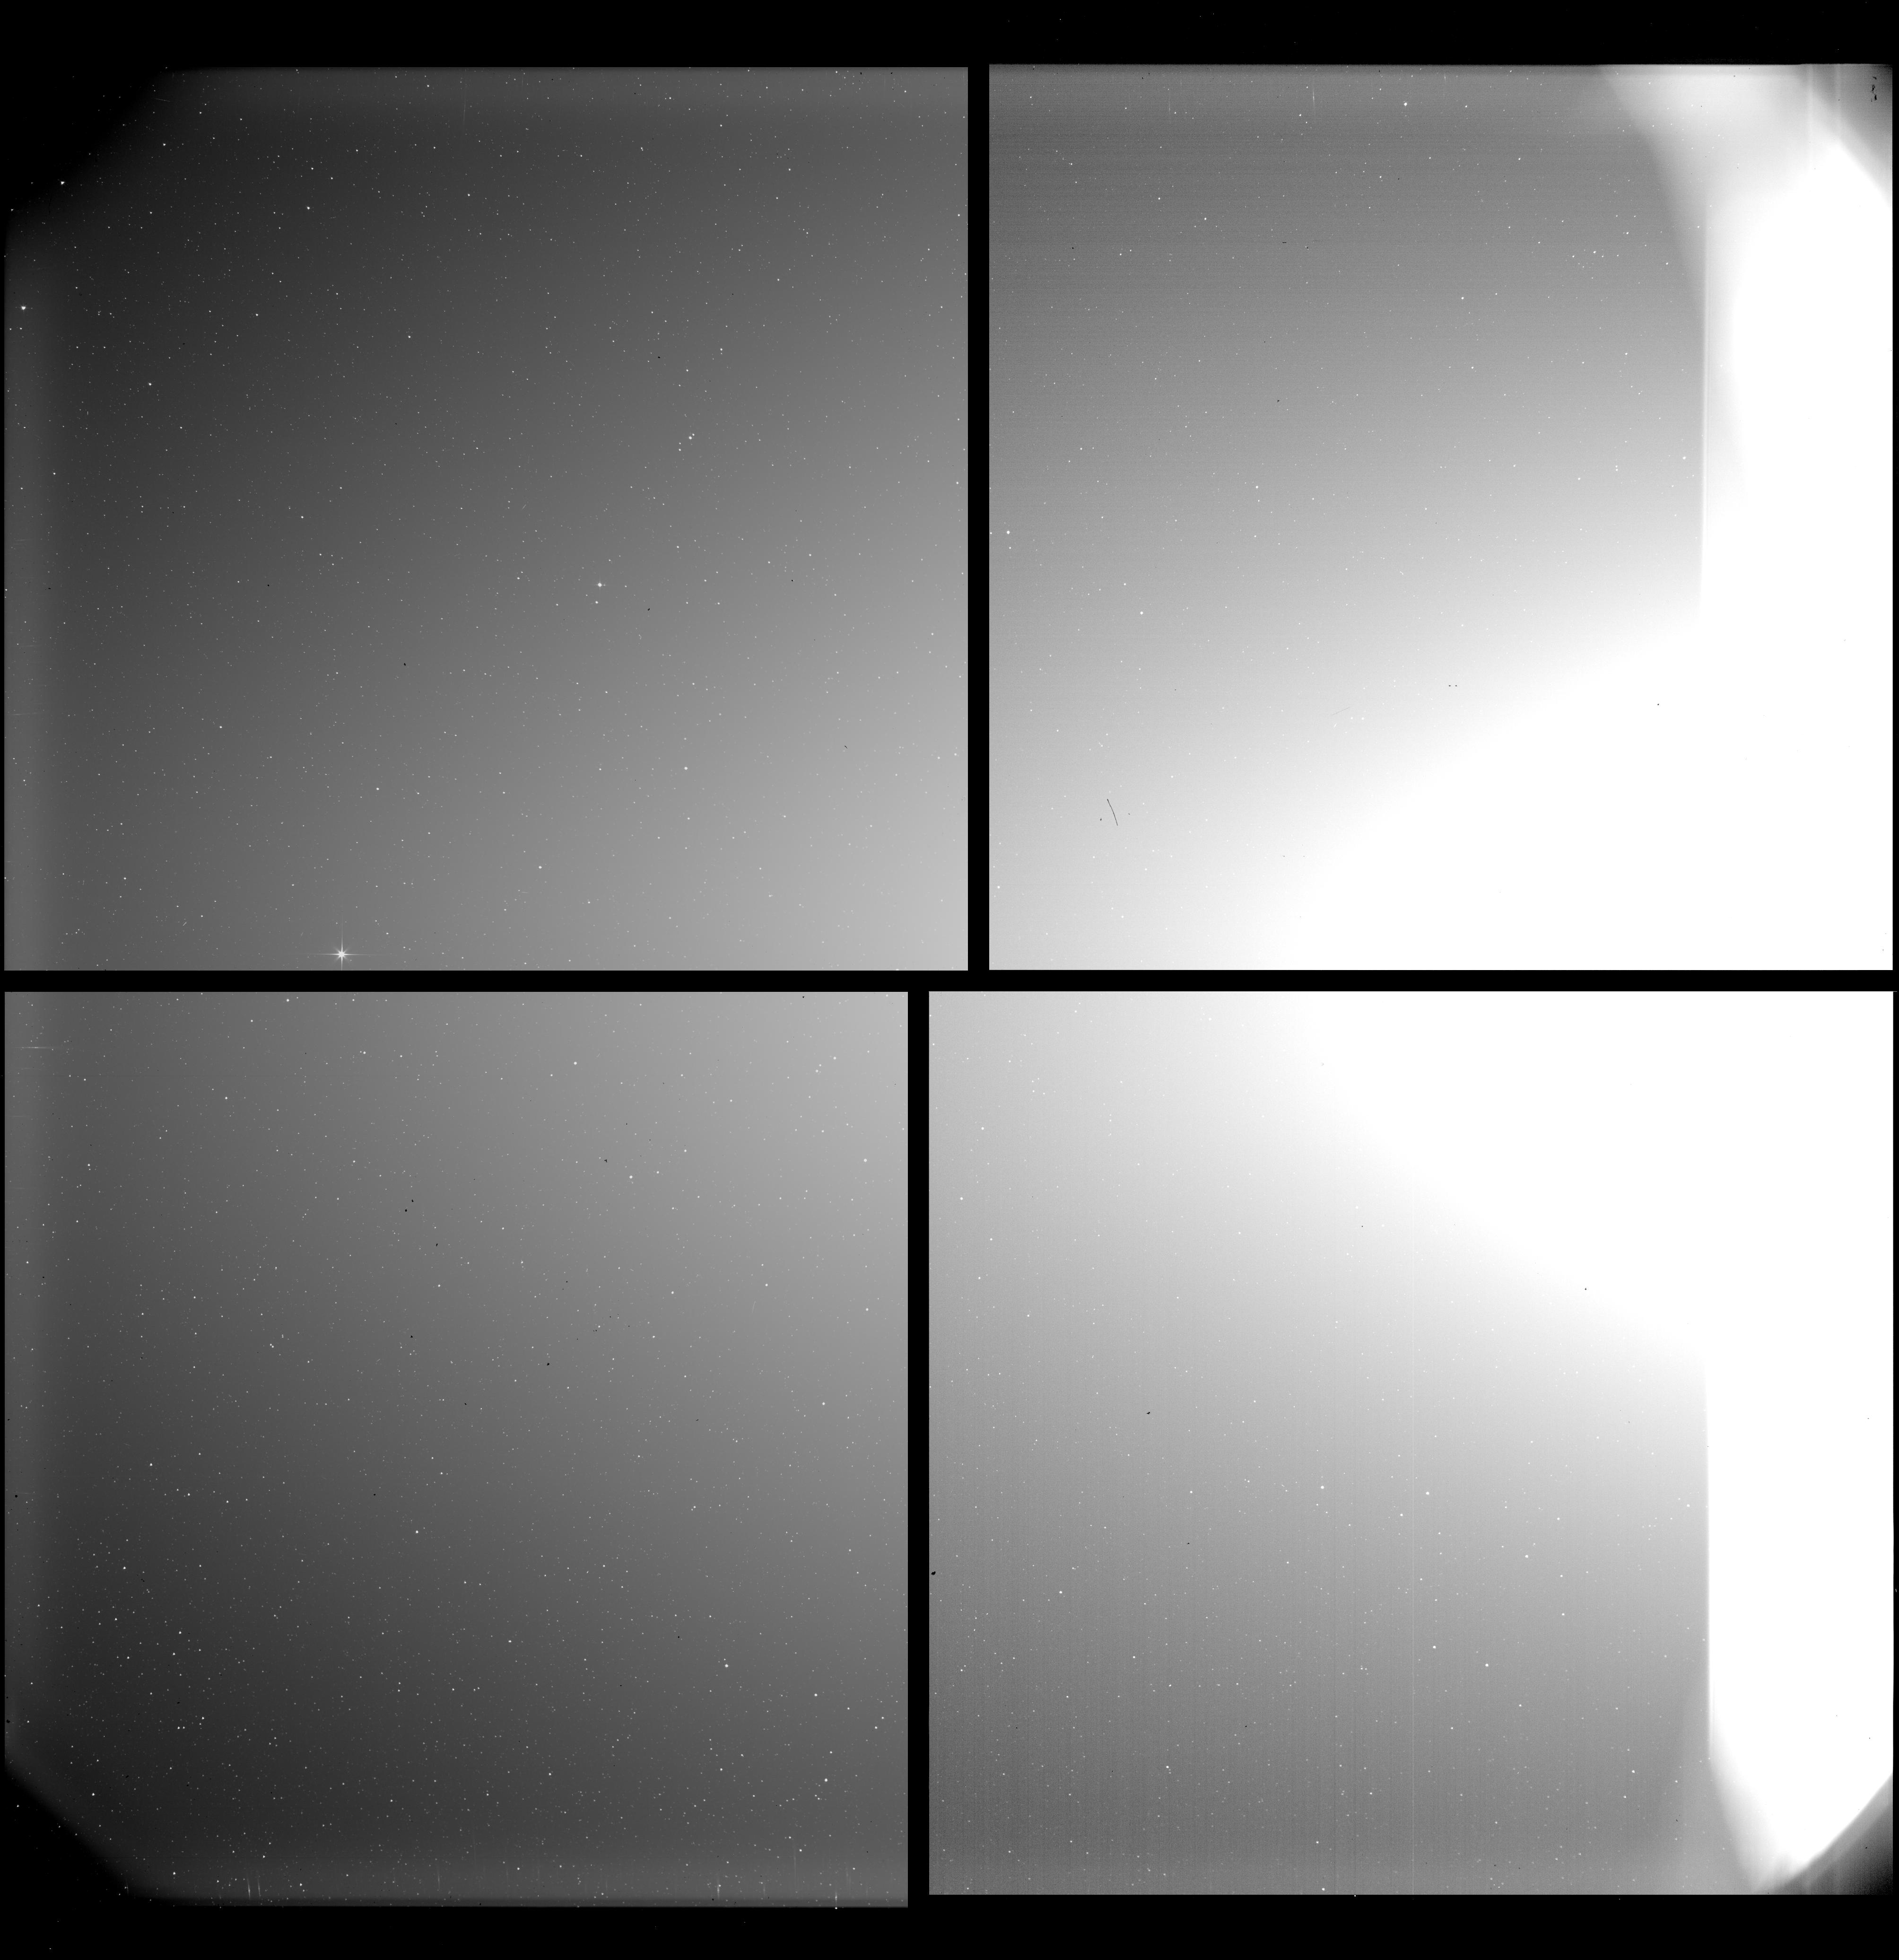 Solar_Orbiter_SoloHI_firstlight.png